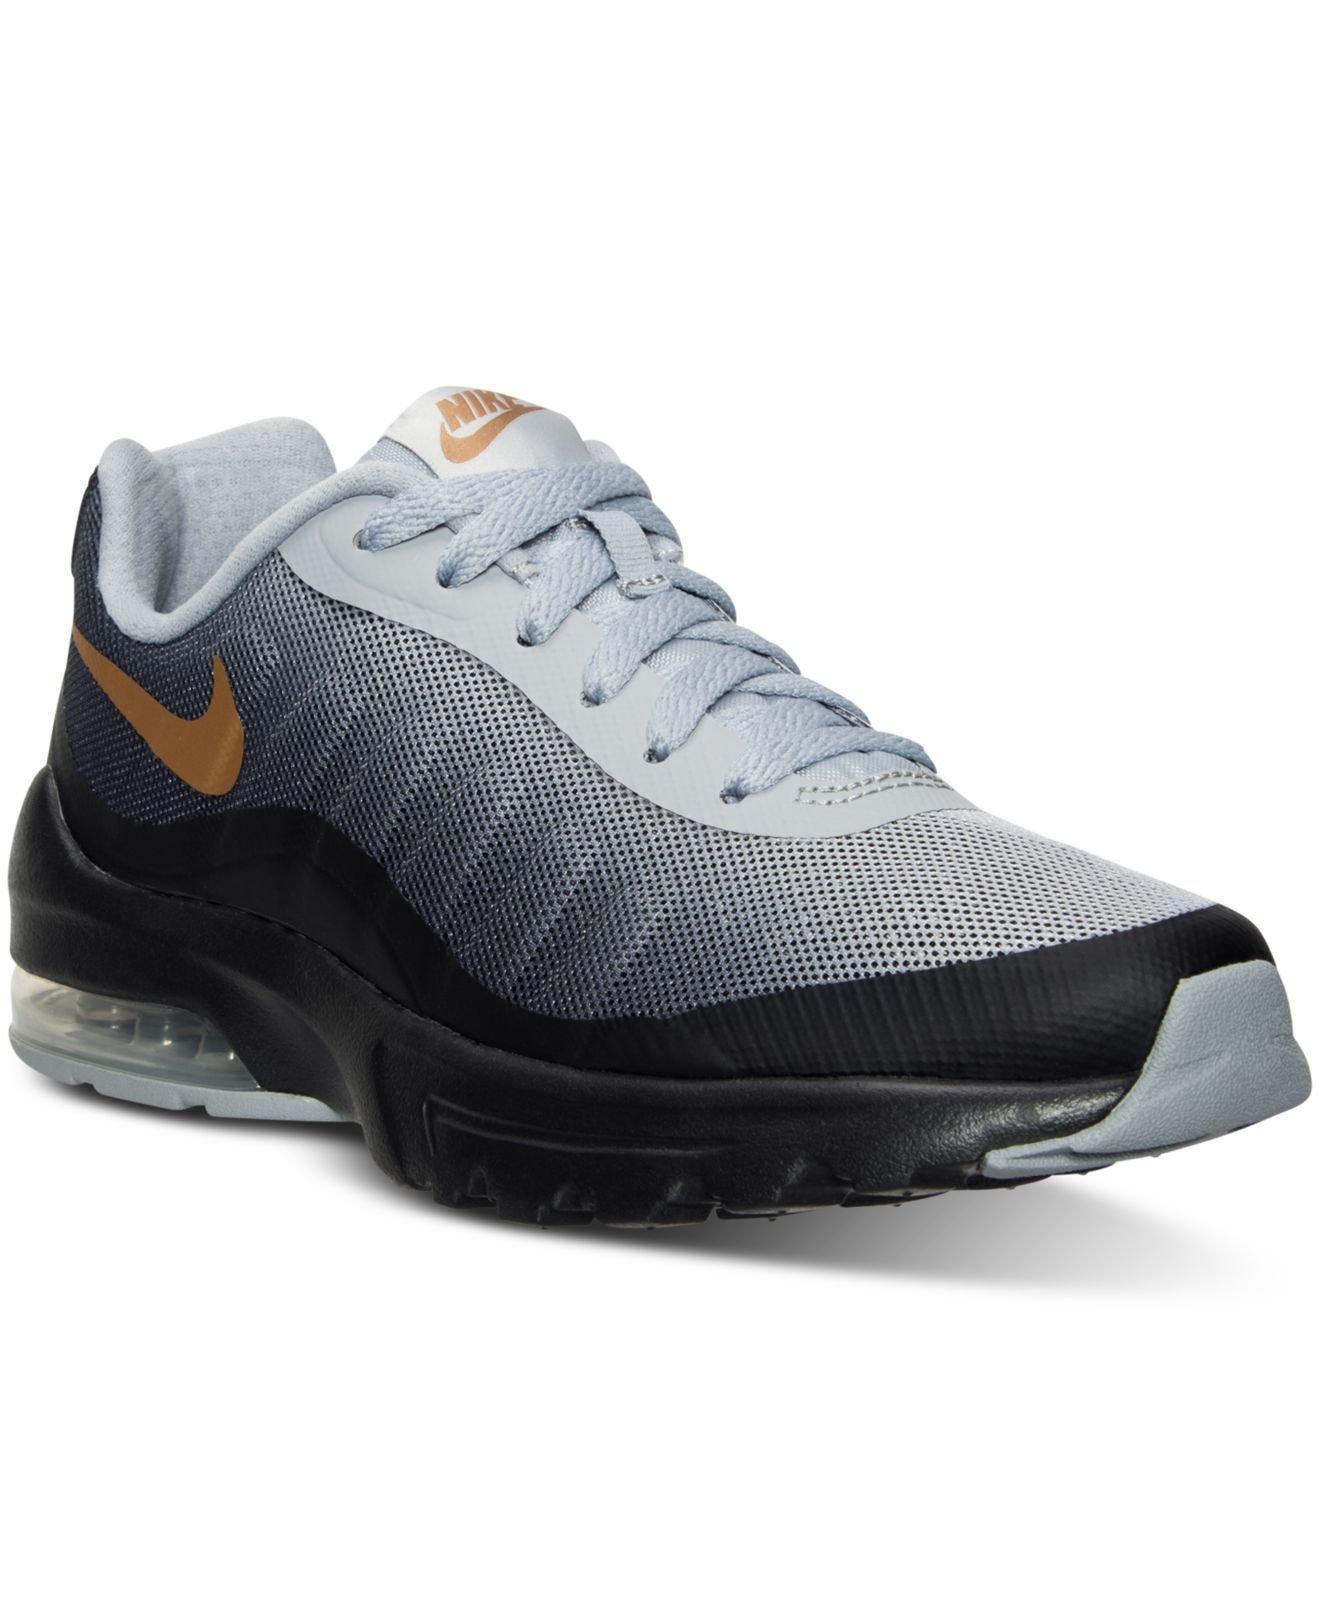 Nike Women S Air Max Invigor Print Running Sneakers From